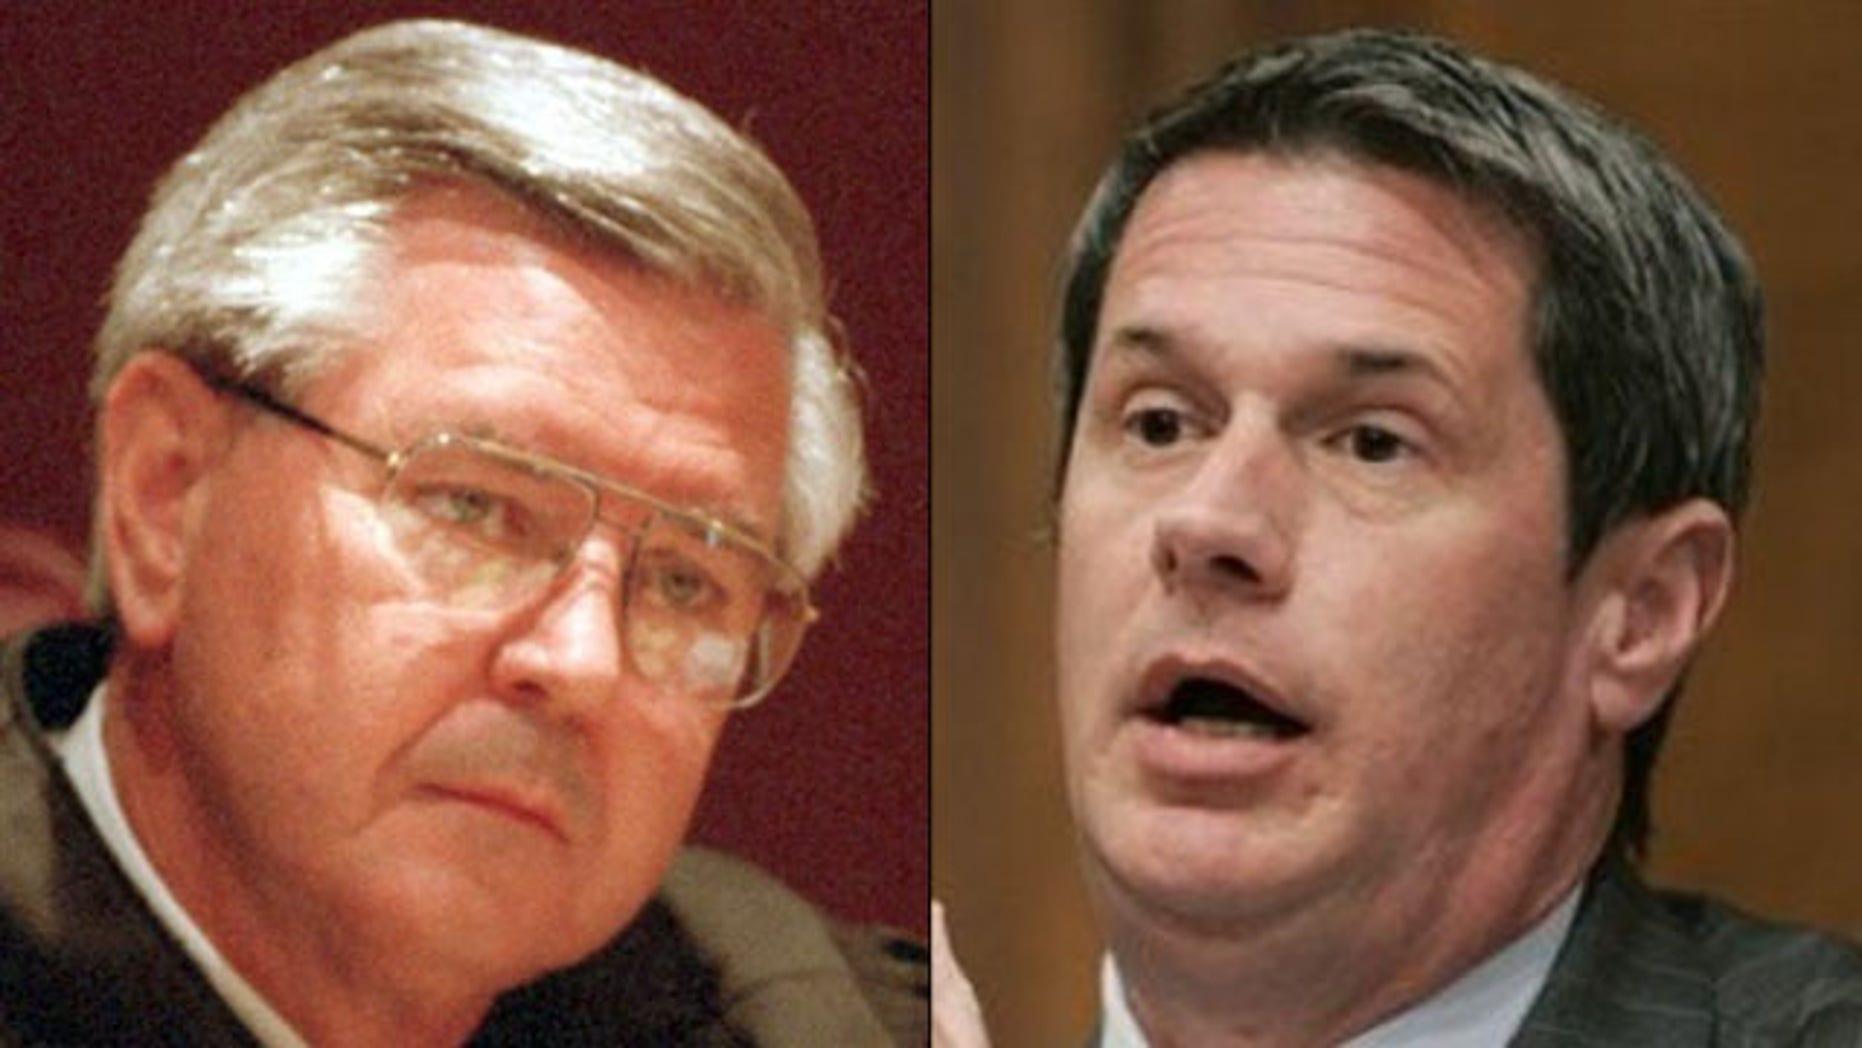 Shown here are Louisiana Senate candidate Chet Traylor, left, and Sen. David Vitter. (AP Photos)